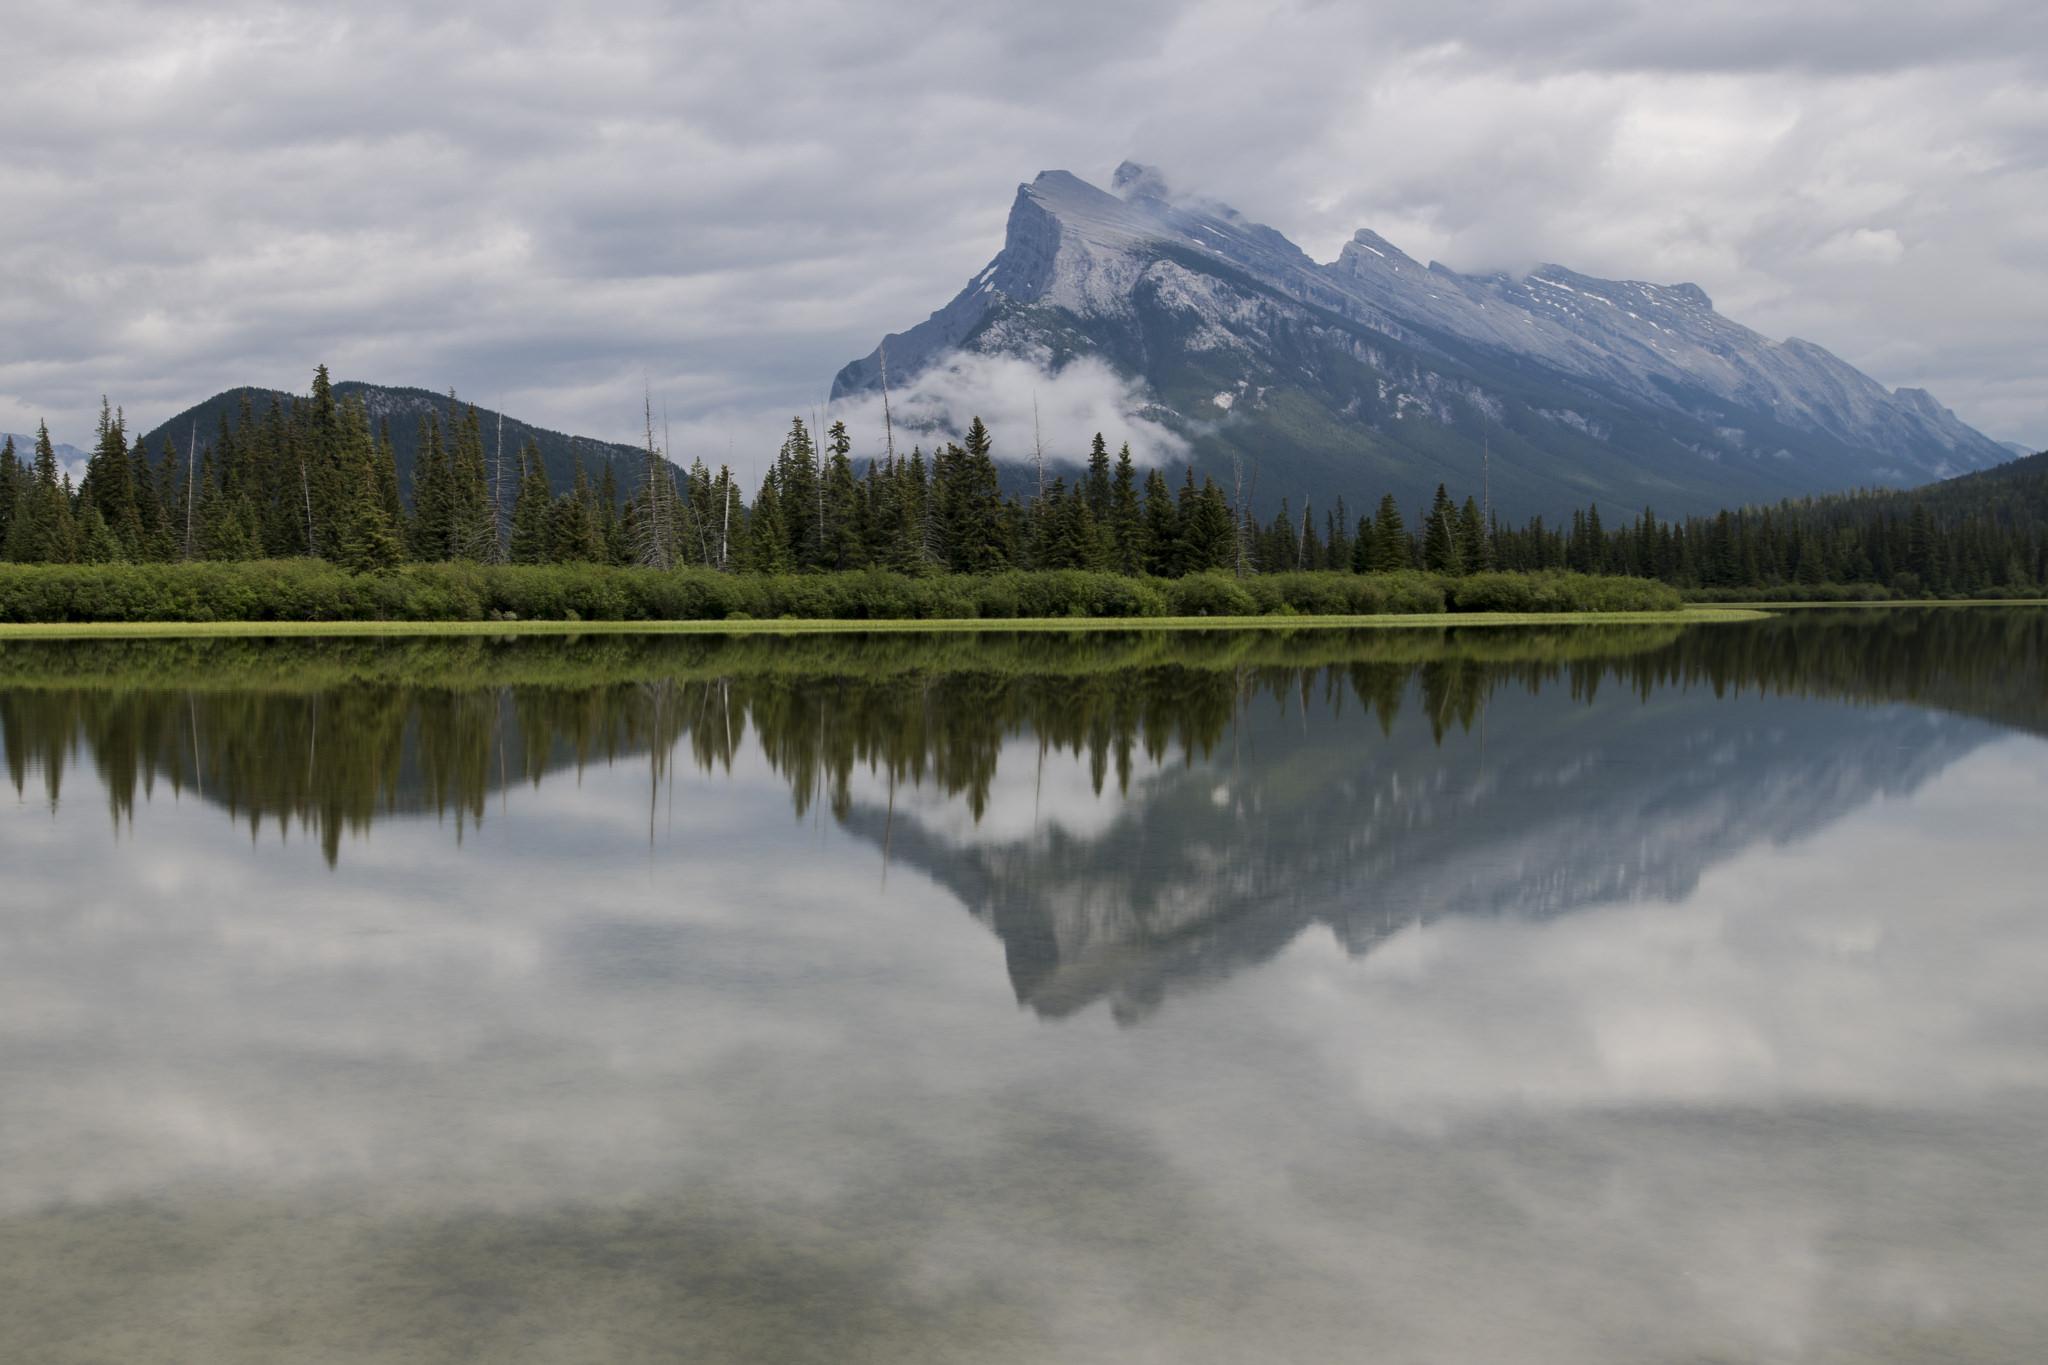 Canadian Reflections - Vermillion Lakes (Banff, Canada)